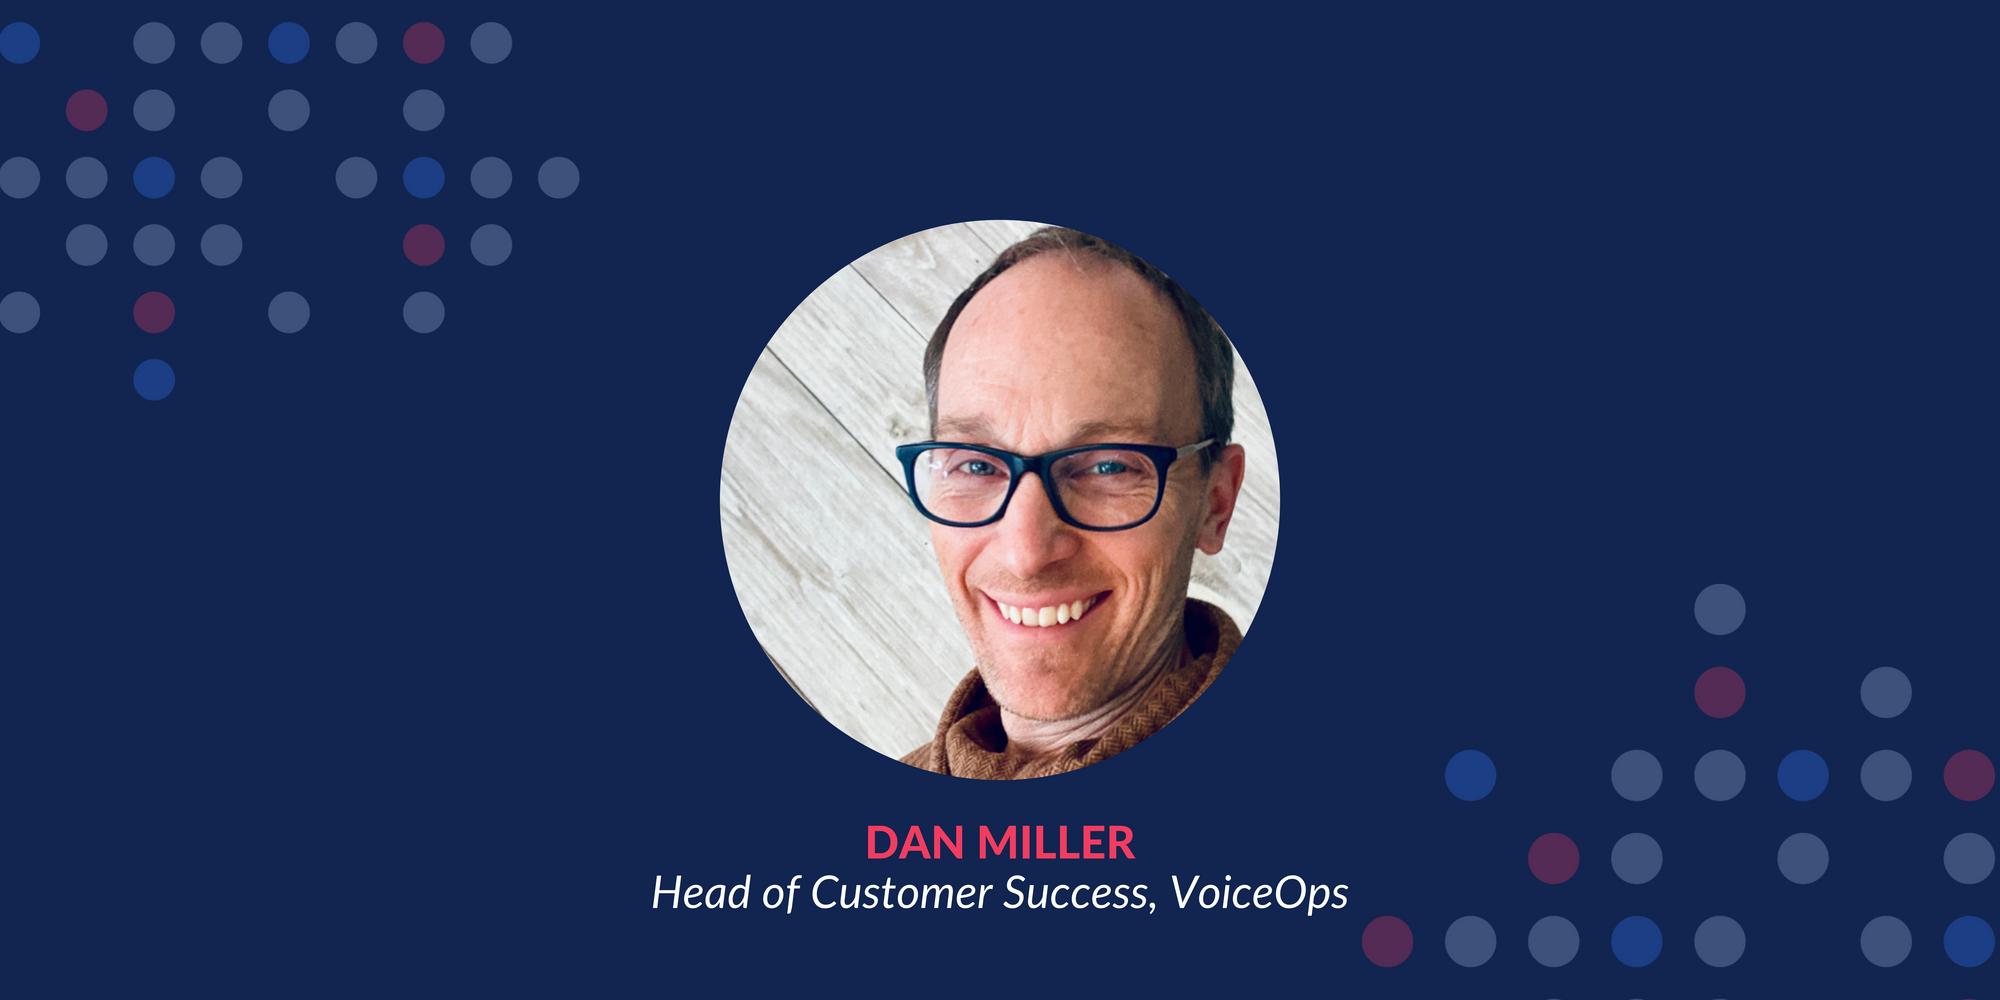 About Dan Miller, Head of Customer Success